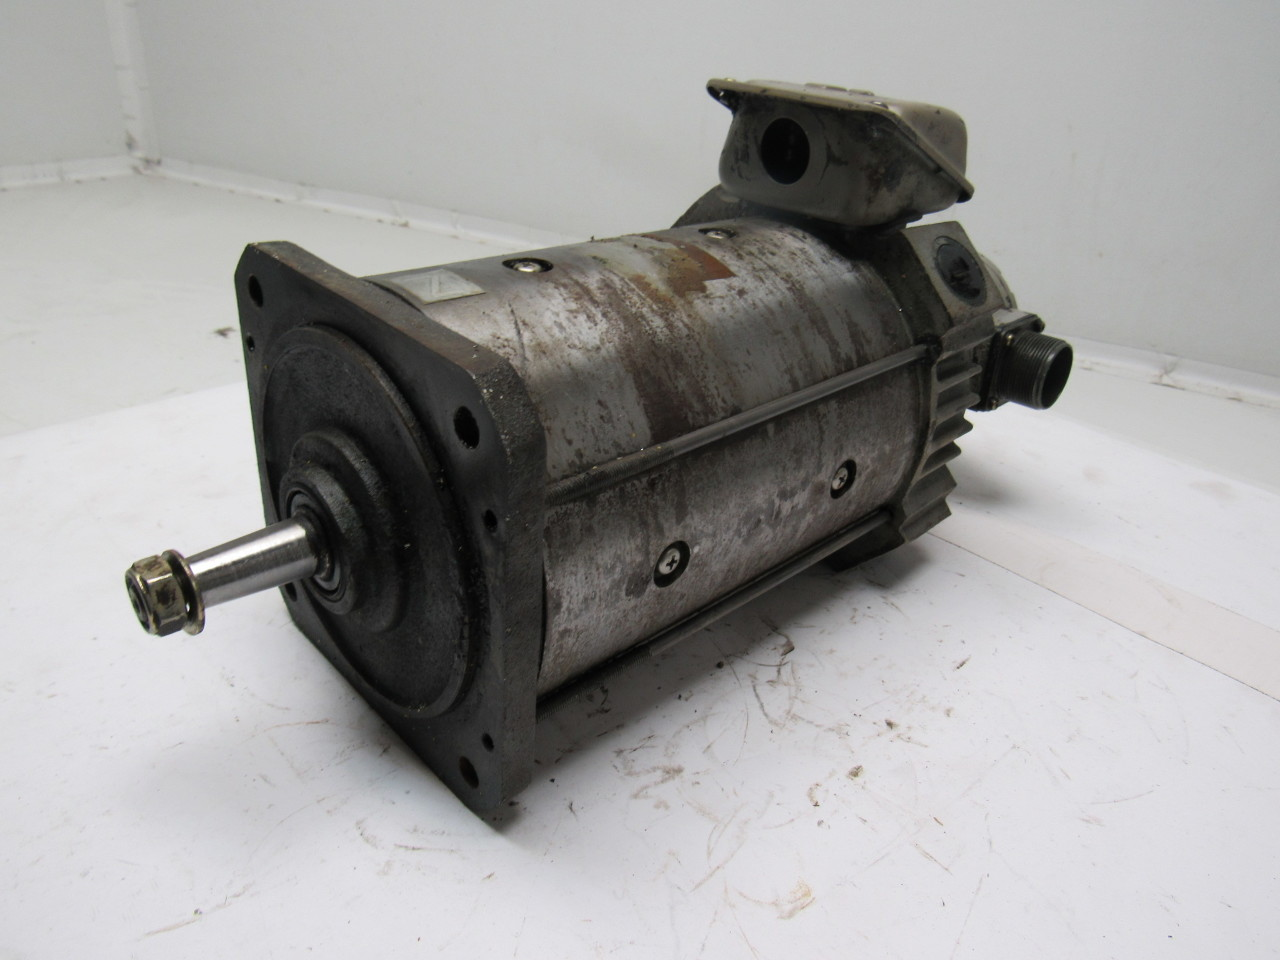 Mitsubishi Electric Hd 81 12s Dc Servo Motor From A Mazak